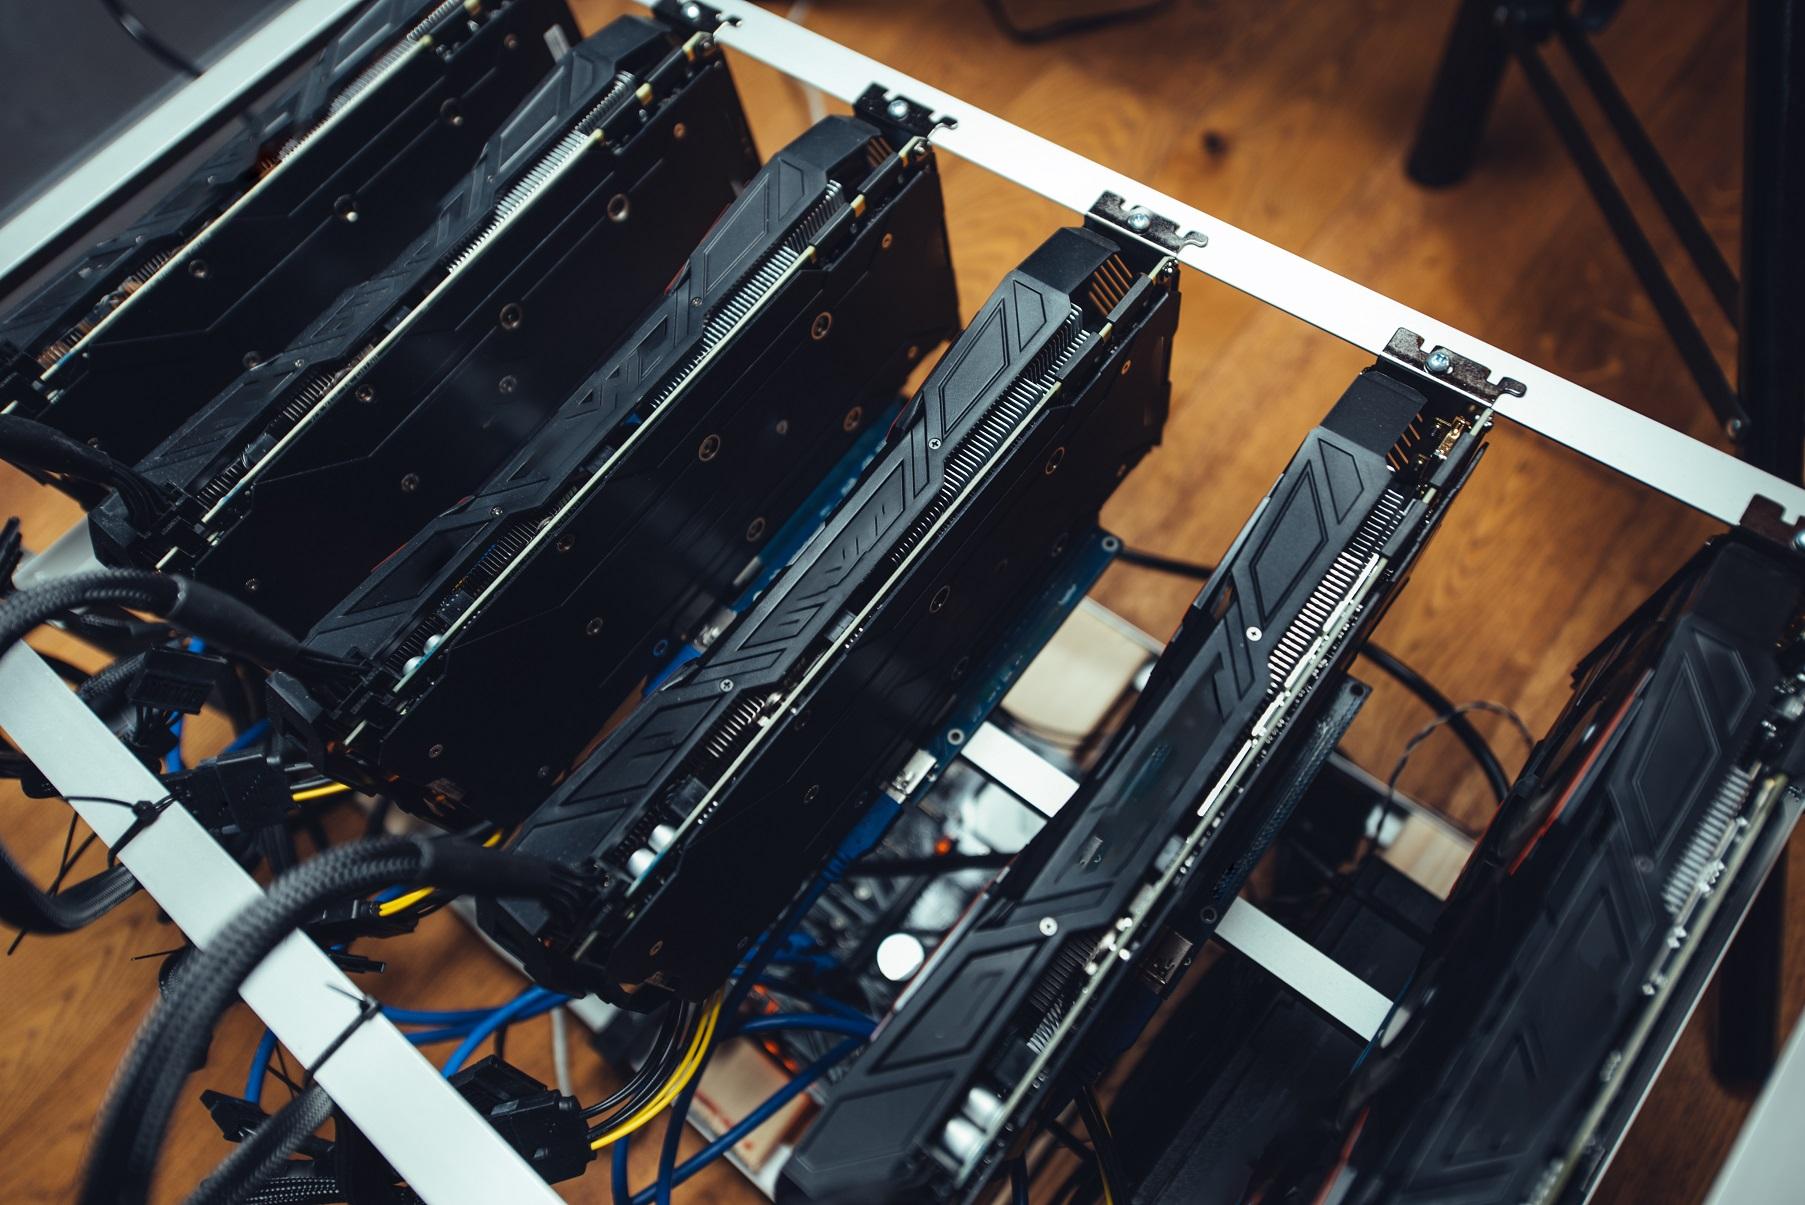 cryptocurrency mining rig graphics cards mining bi PJKUF6P #новости Абхазия, криптовалюта, майнинг